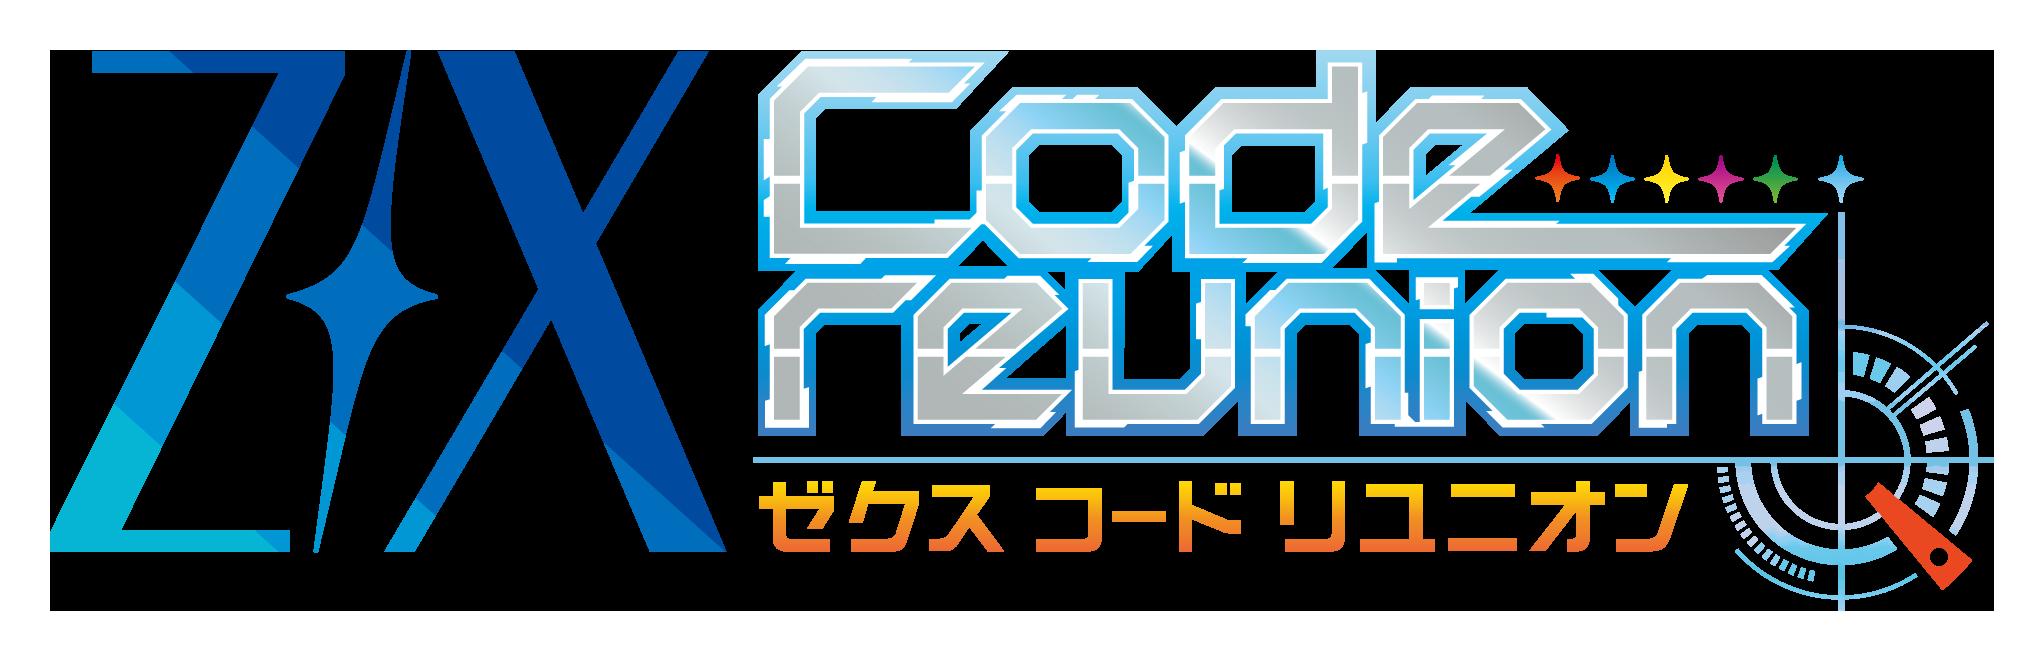 【Z/X Code reunion】Blu-ray発売決定!!